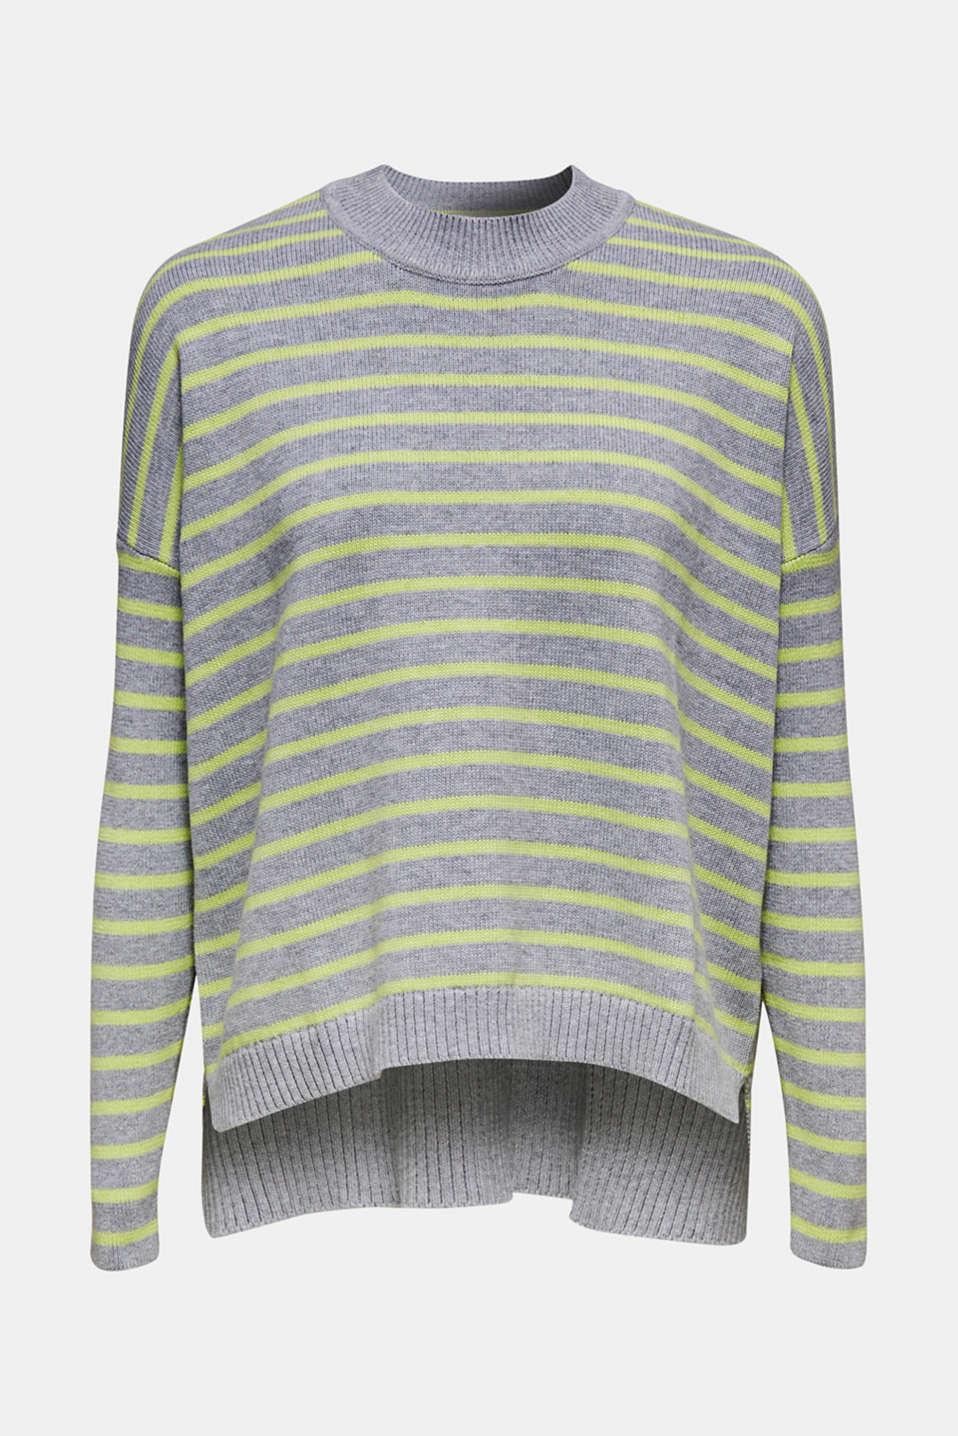 Oversized jumper with stripes, 100% cotton, LIGHT GREY 4, detail image number 5